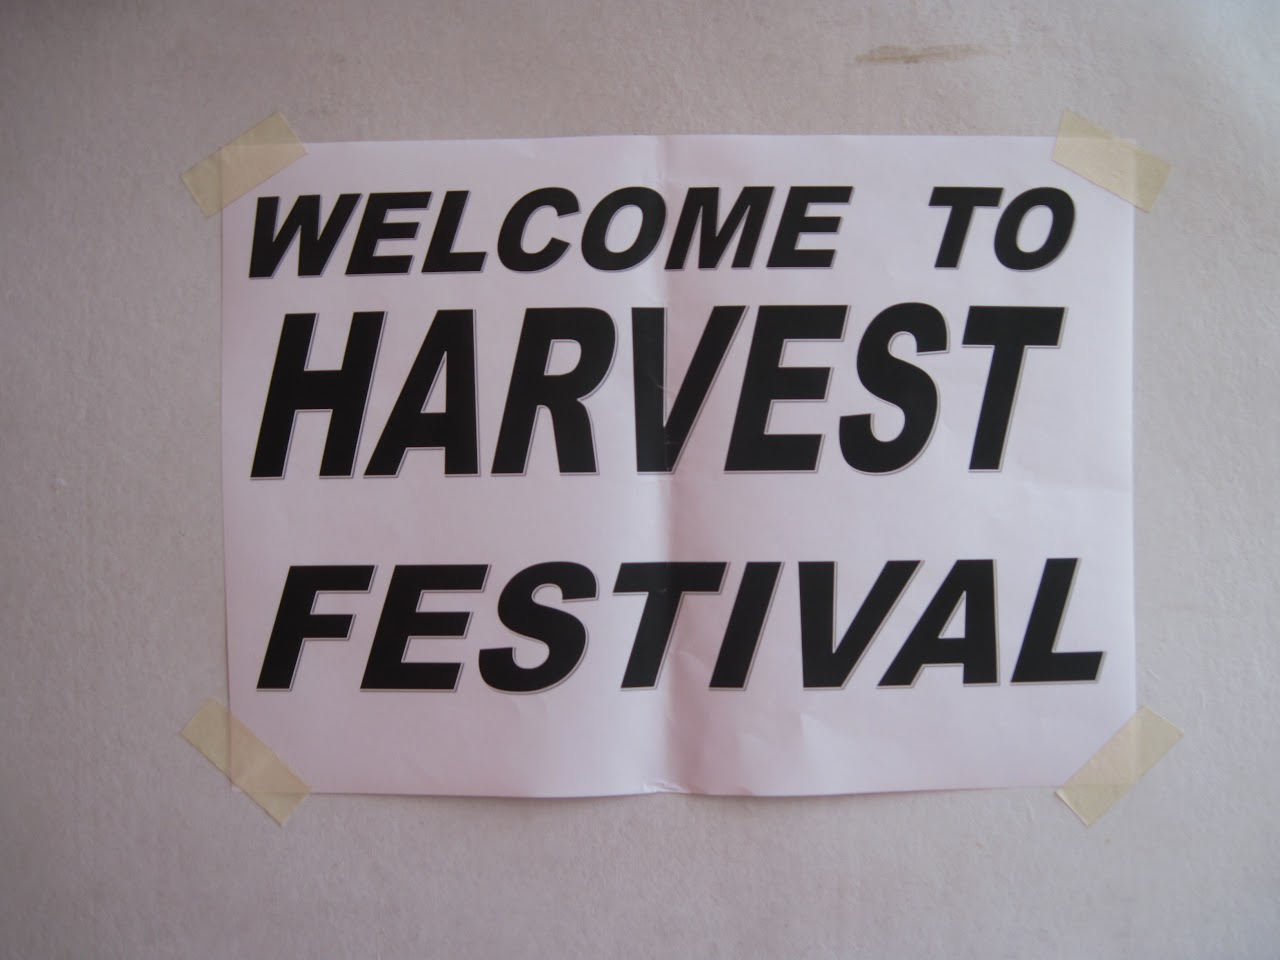 Harvest Festival, 2012 - 59A5CC2F.jpg